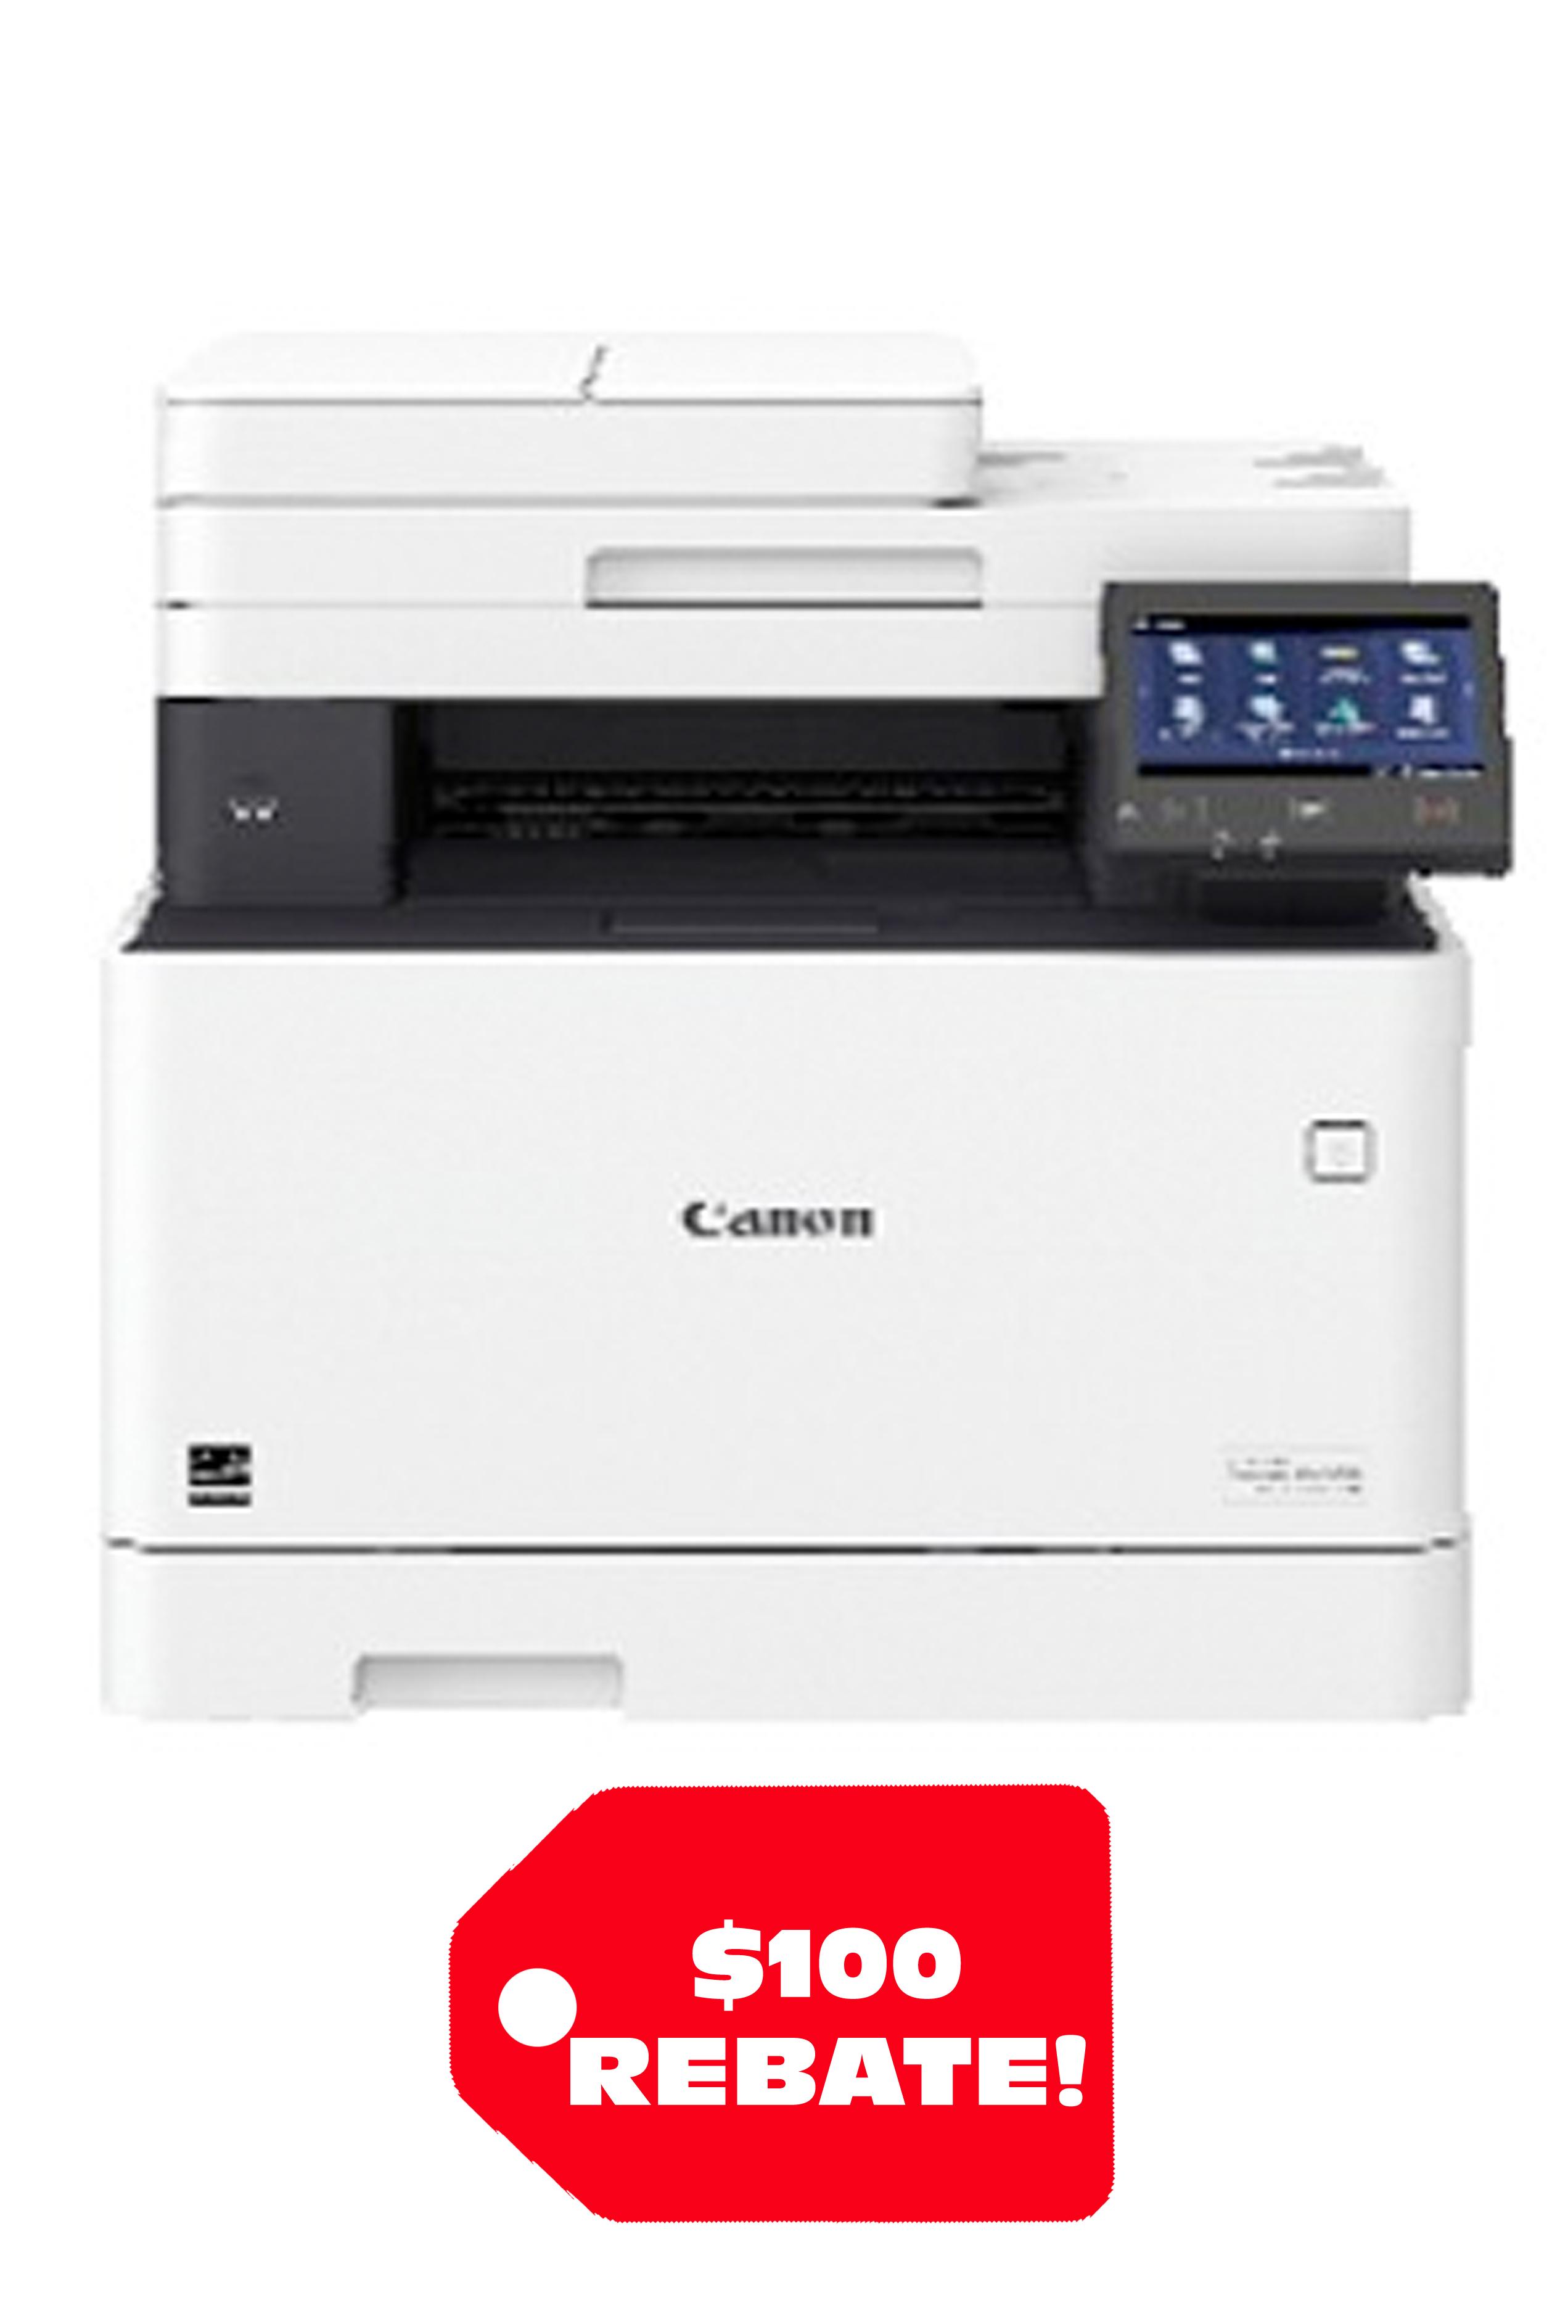 Canon Color imageCLASS MF741Cdw MFP (28ppm)